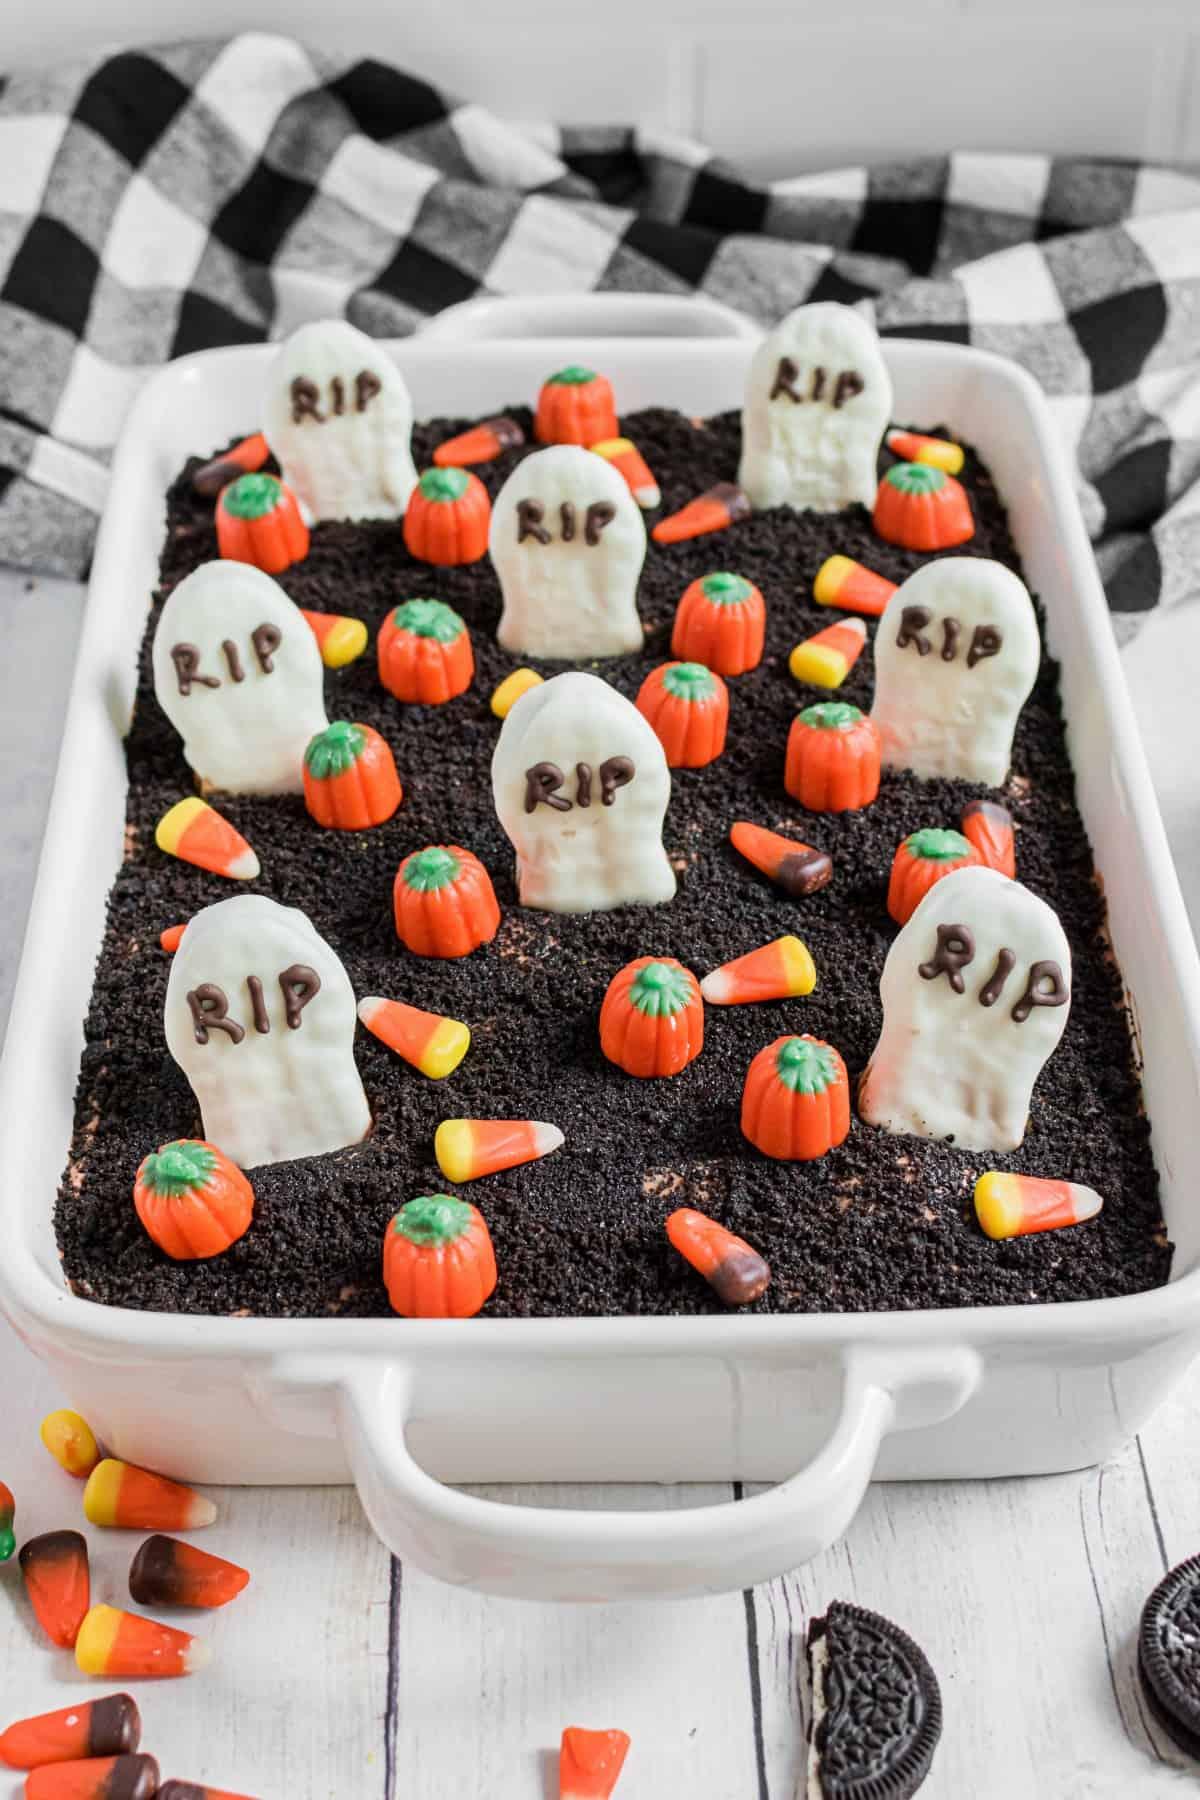 13x9 baking dish with graveyard dirt pudding cake.